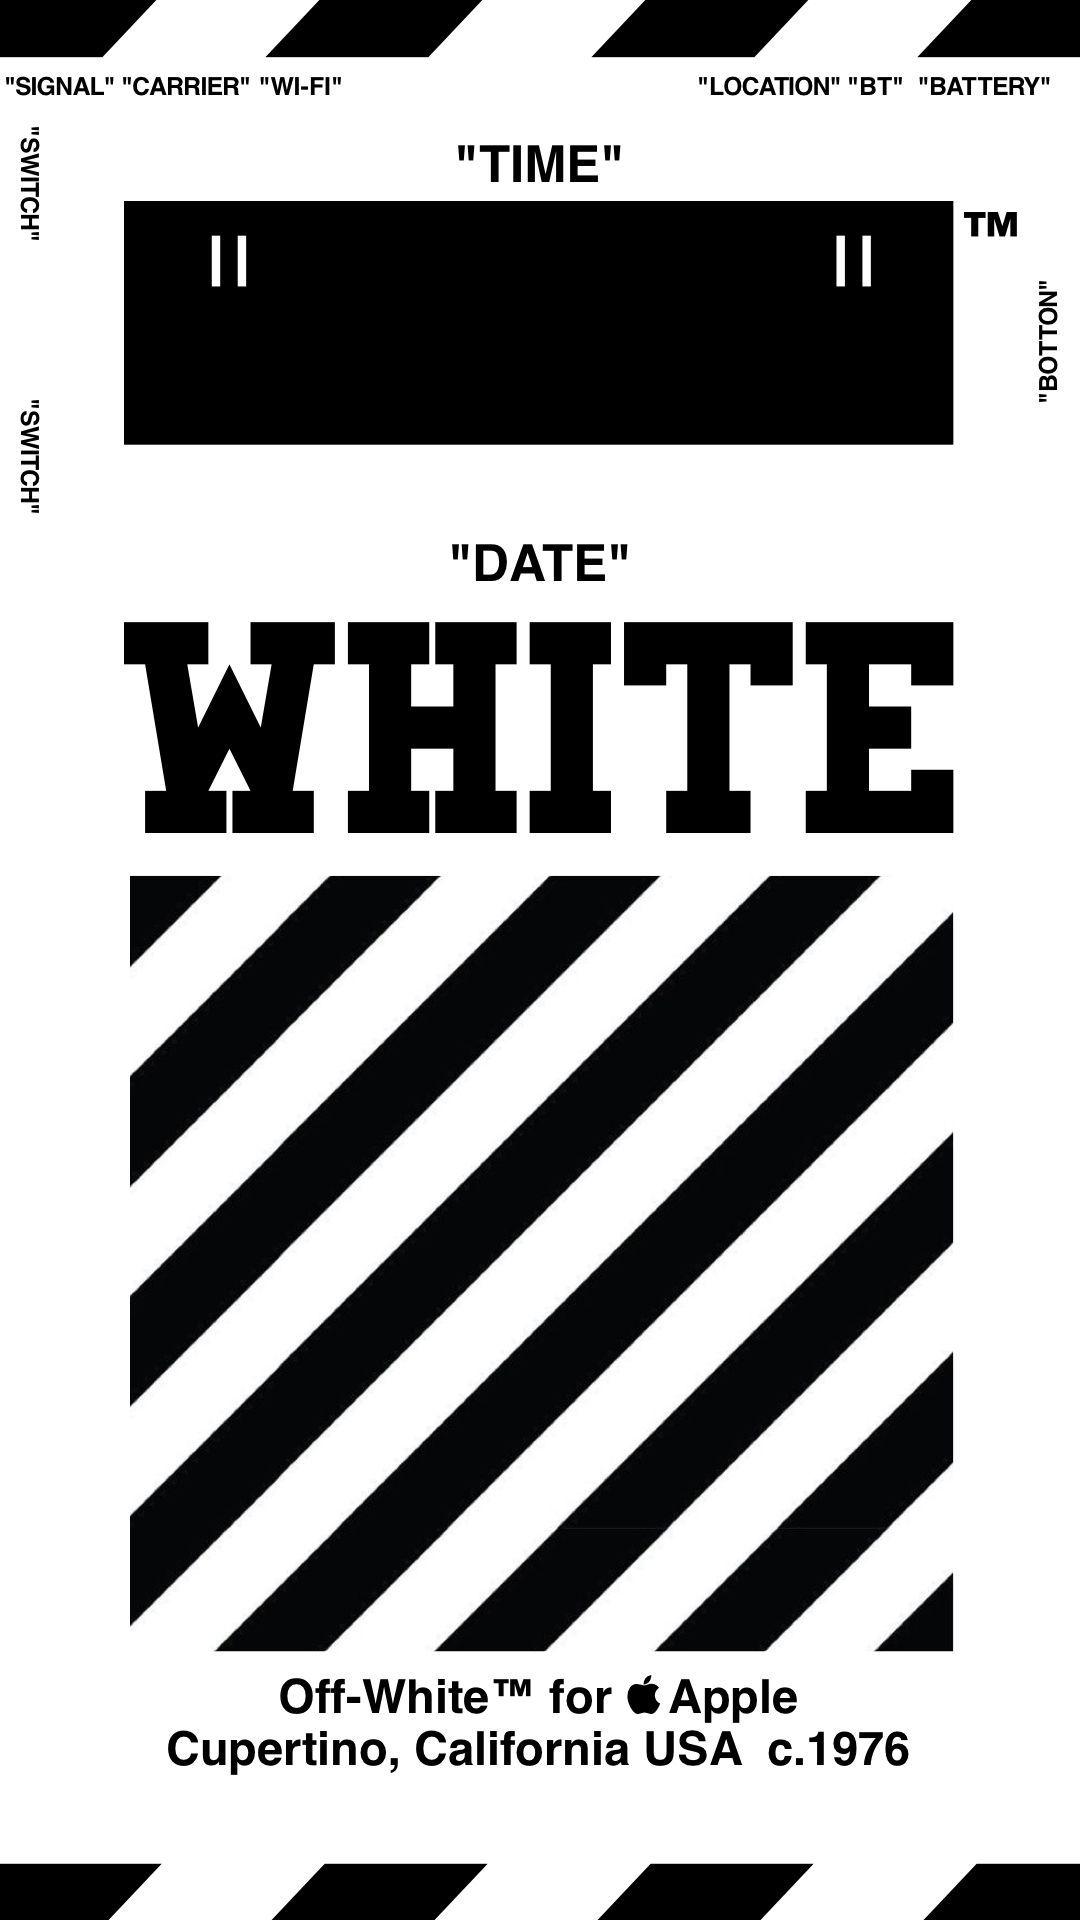 Iphone X Wallpaper Off White Beautiful F Whitea Offwhite Wallpaper Iphone A C White Wallpaper For Iphone Iphone Wallpaper Off White White Wallpaper